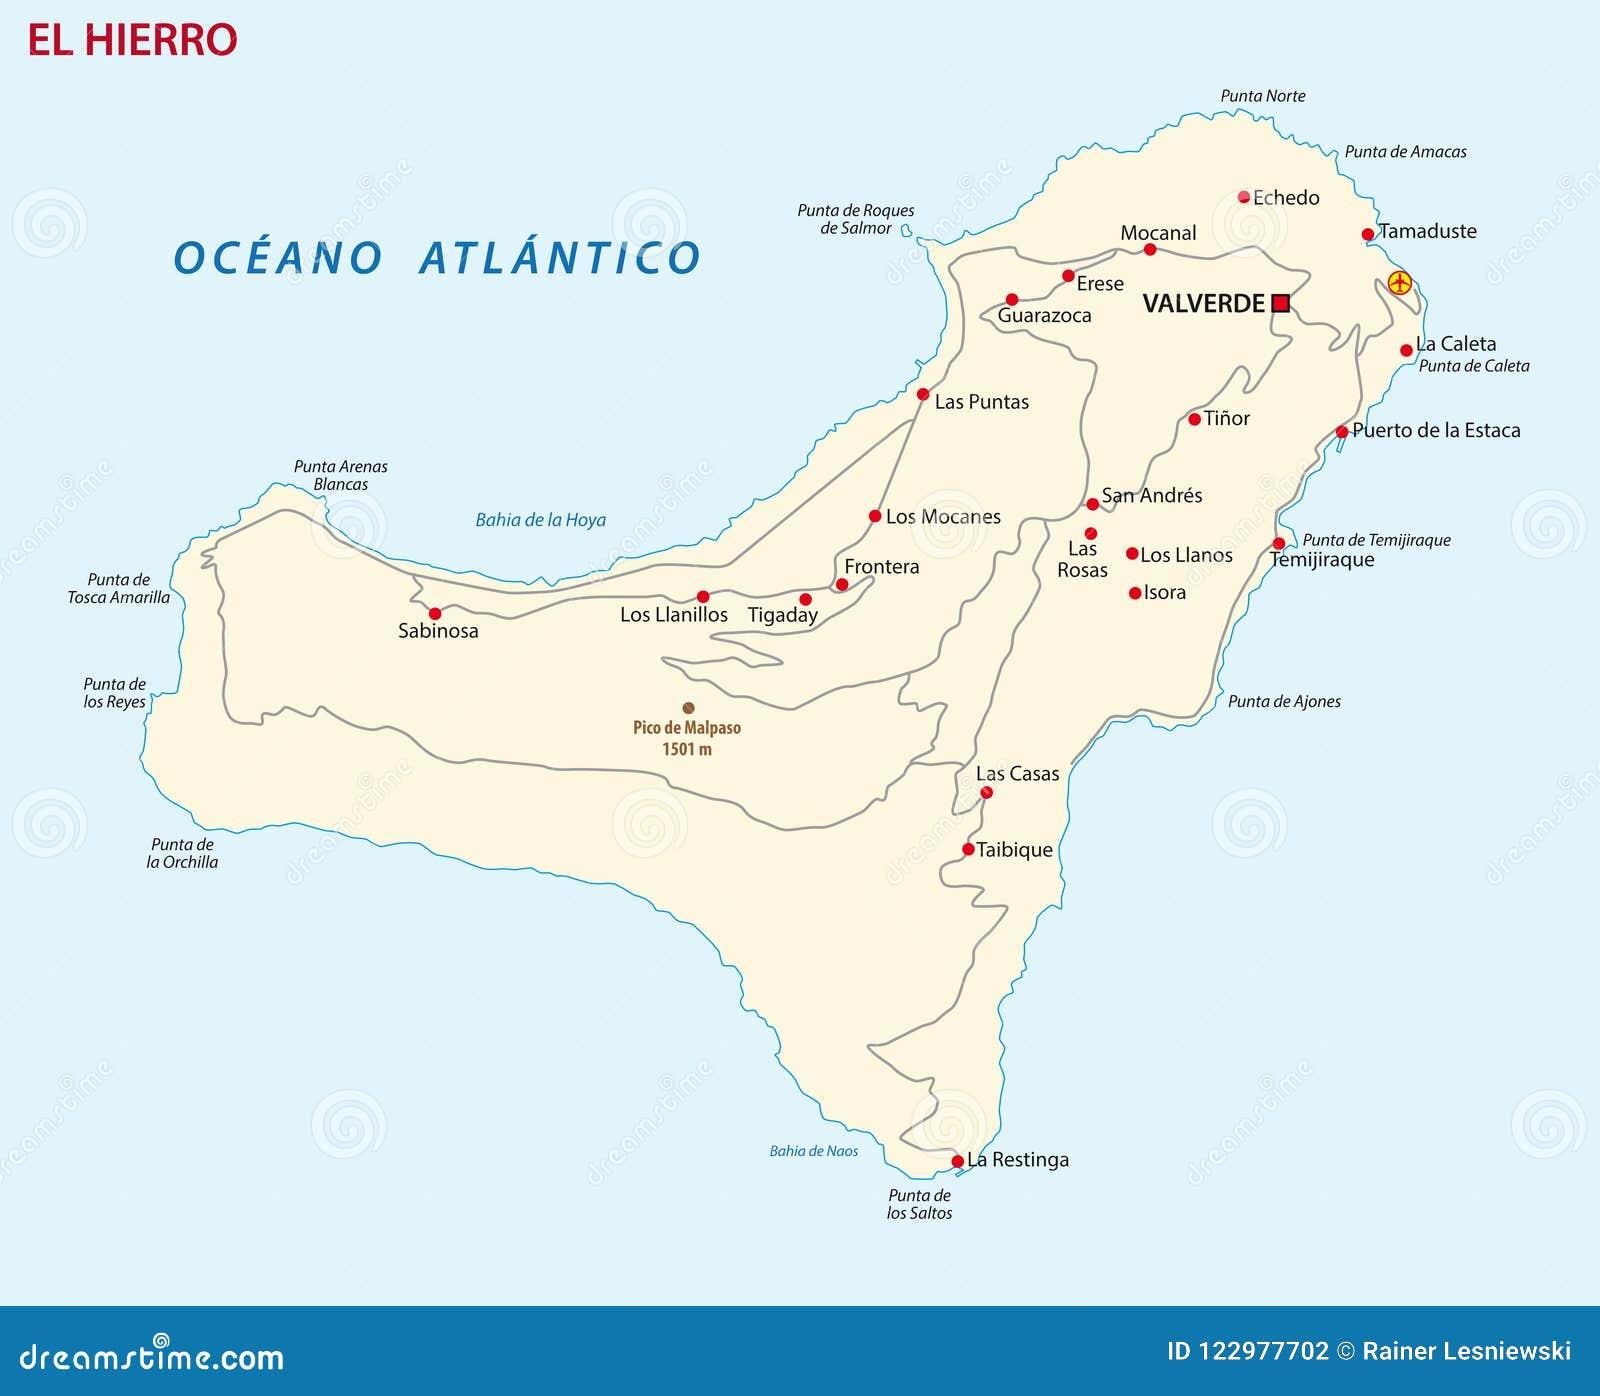 Cartina Geografica Canarie.Cartina Geografica Delle Isole Canarie Niylementine